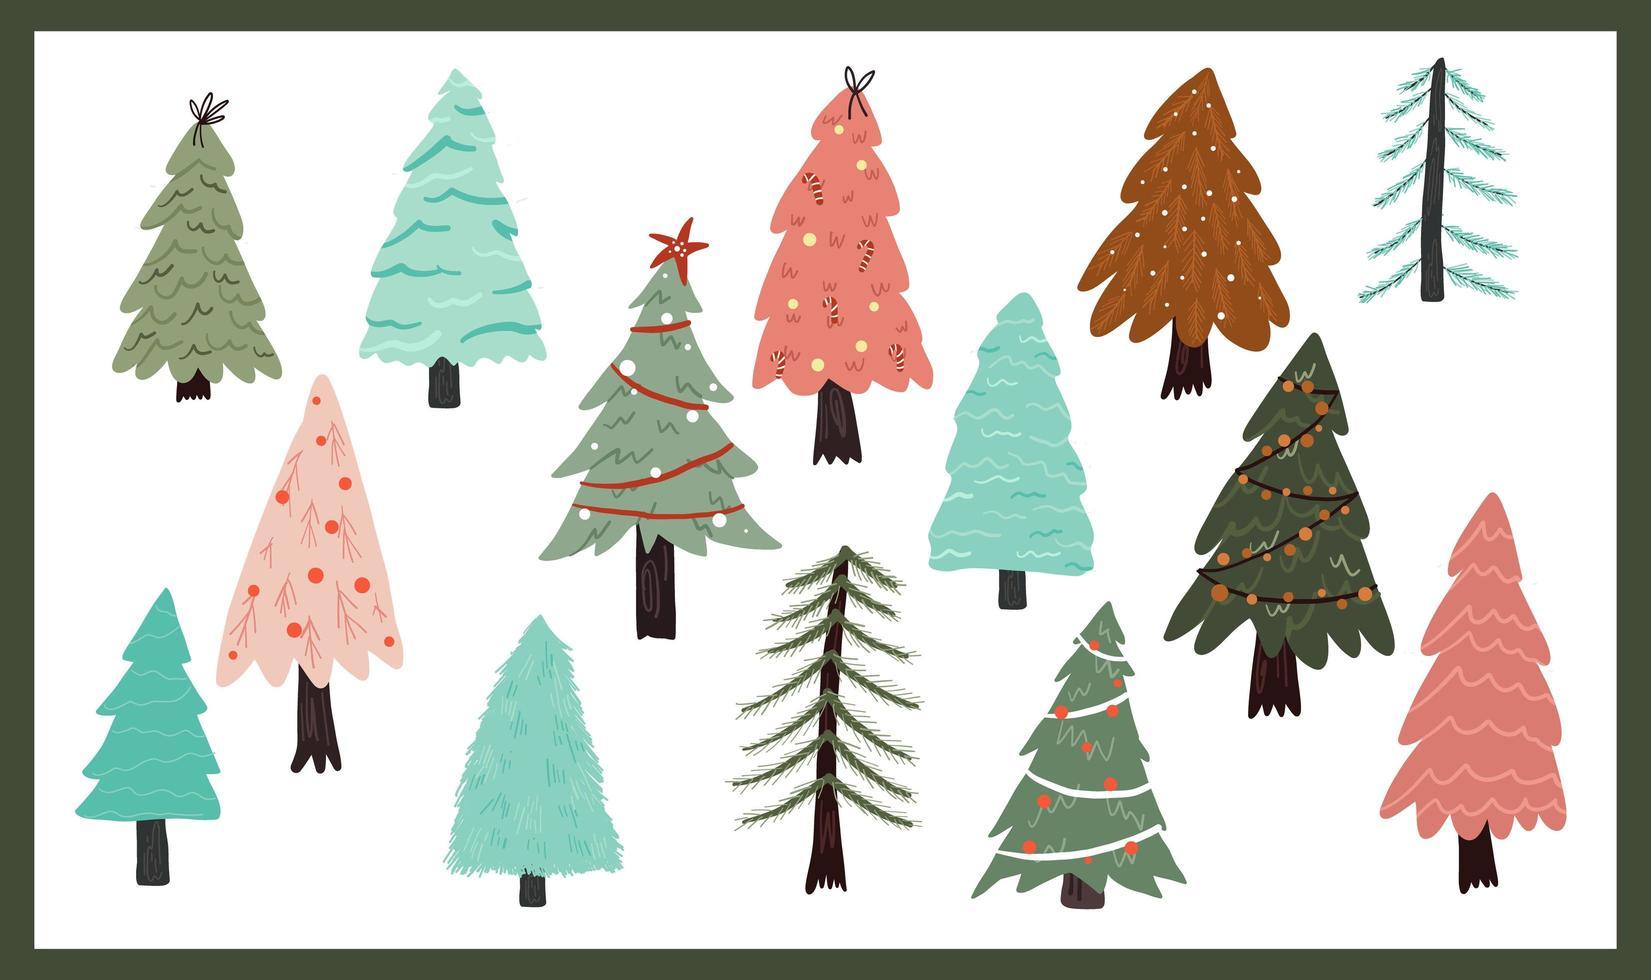 Éléments d'arbre mignon de Noël vecteur